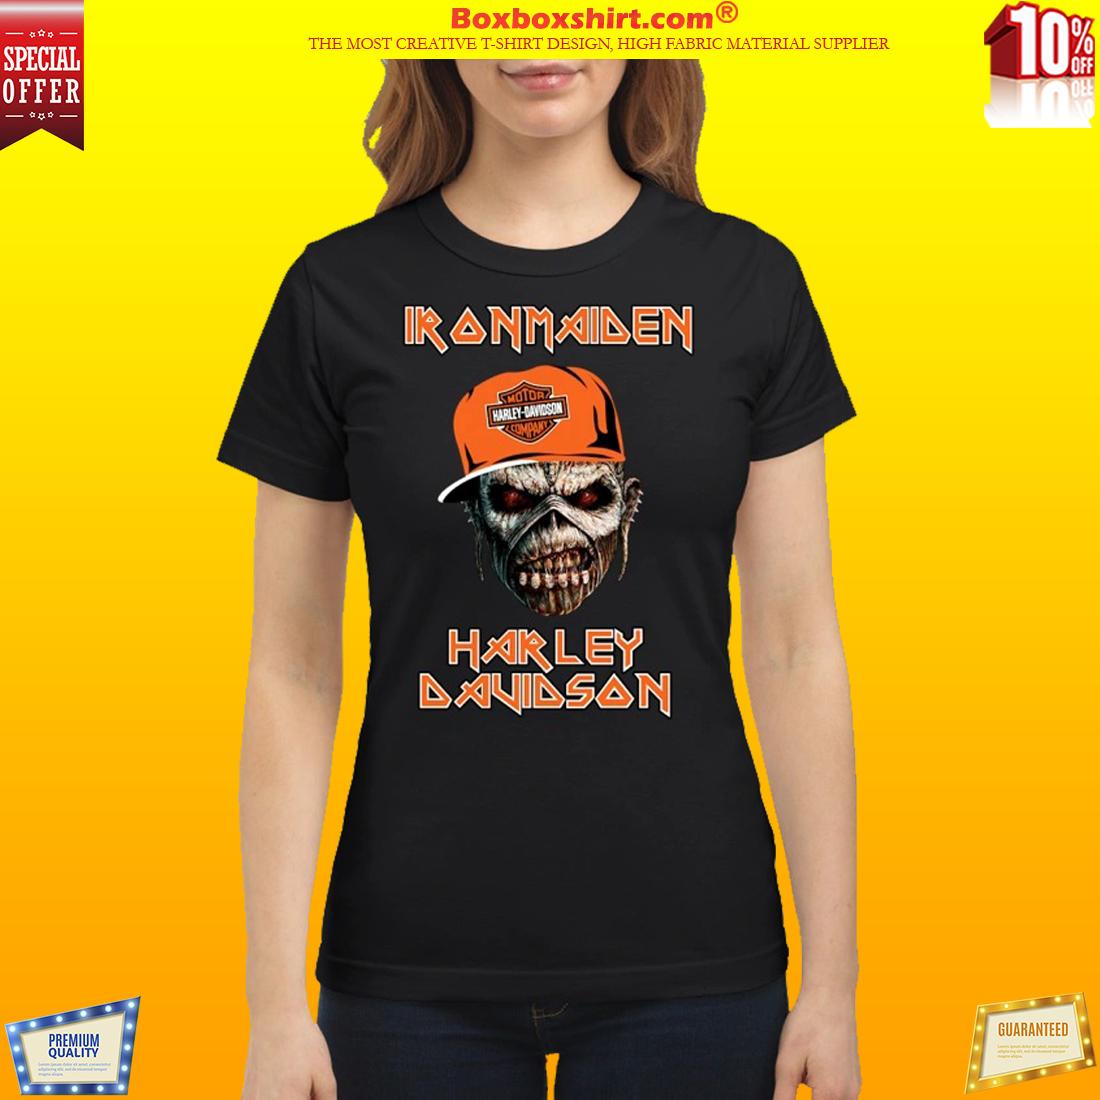 Iron maiden Harley Davidson skull t classic shirt